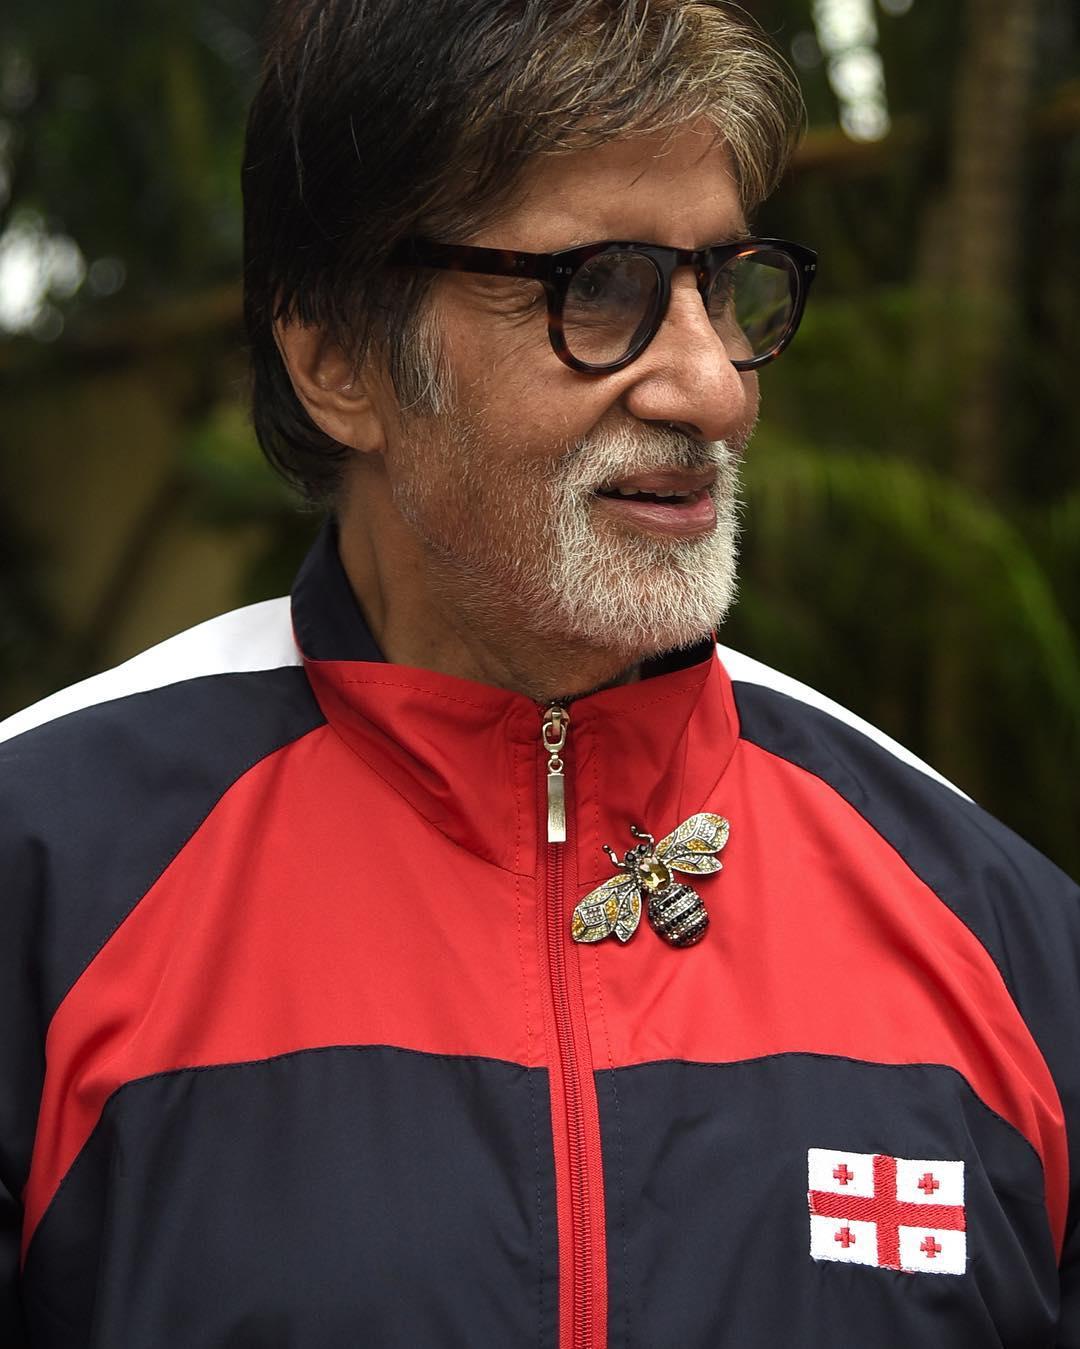 Amitabh Bachchan Photo | Amitabh Bachchan Image | Amitabh Bachchan Picture